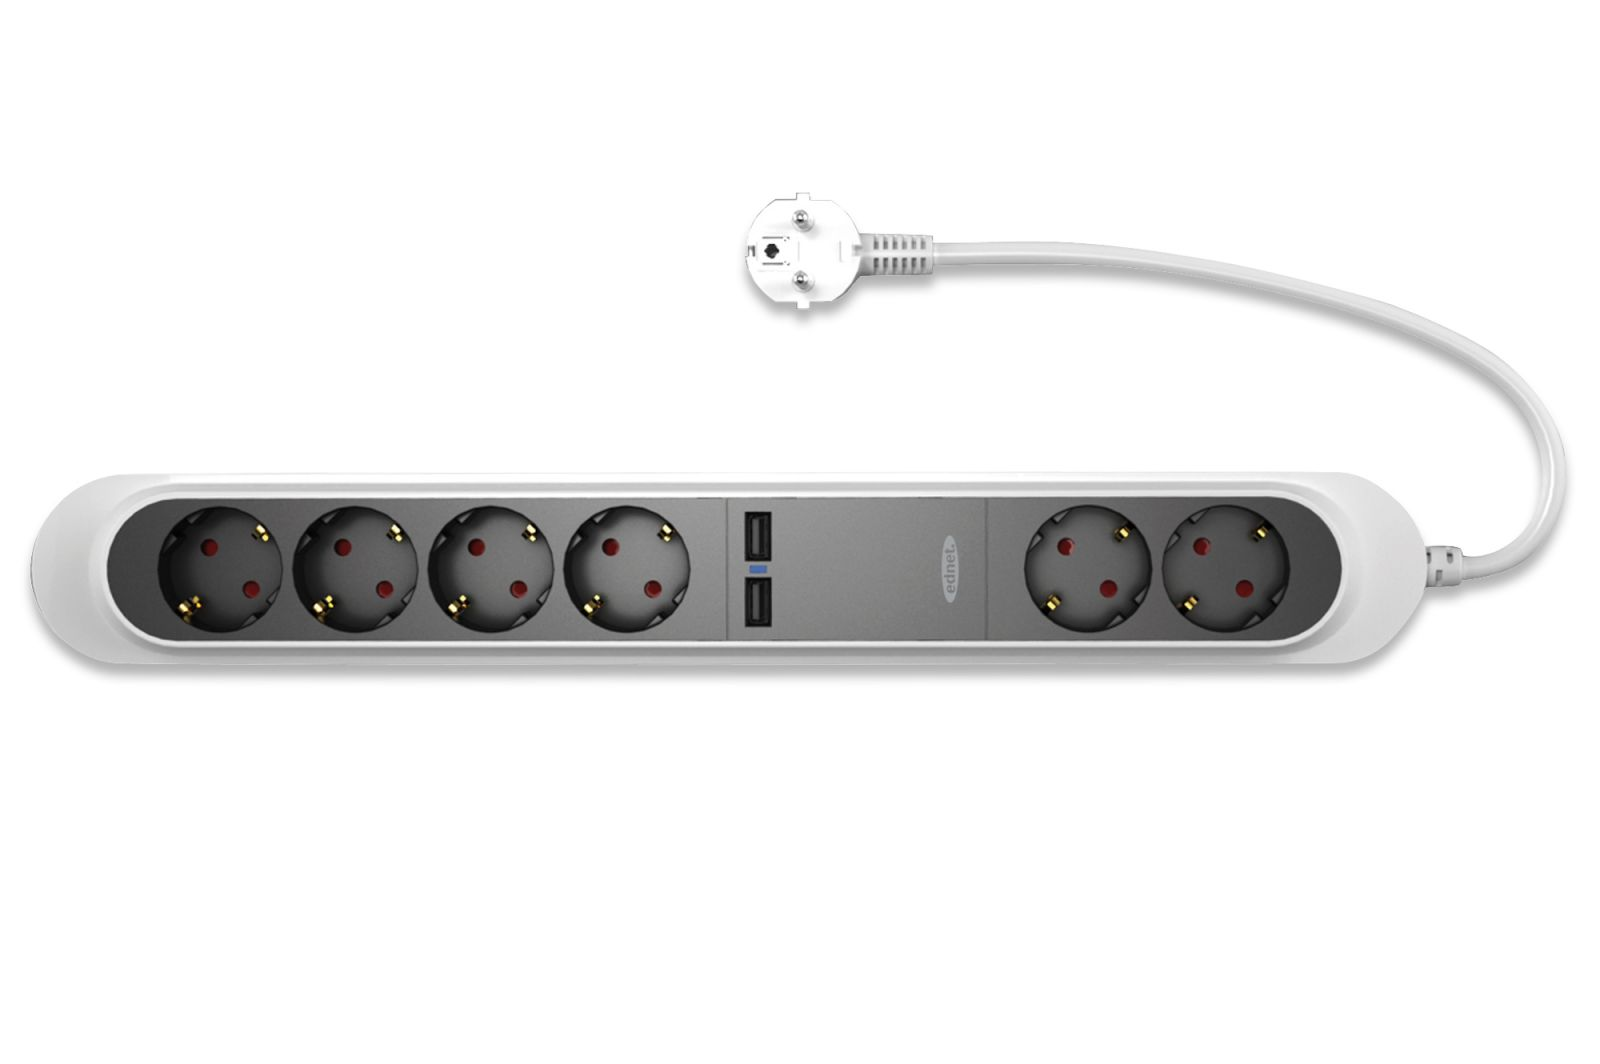 Ednet produžni kabel sa USB-om